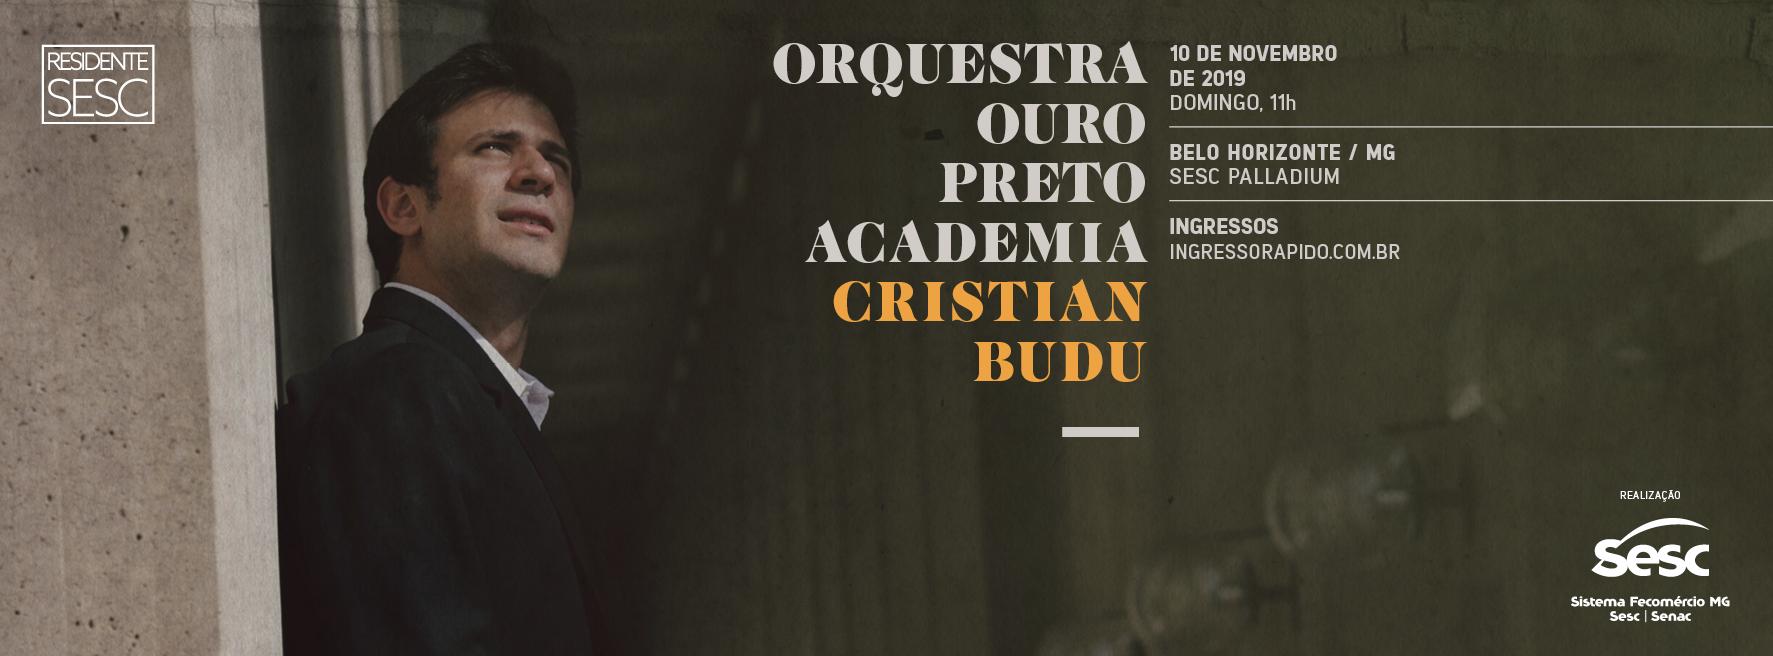 Cristian Budu